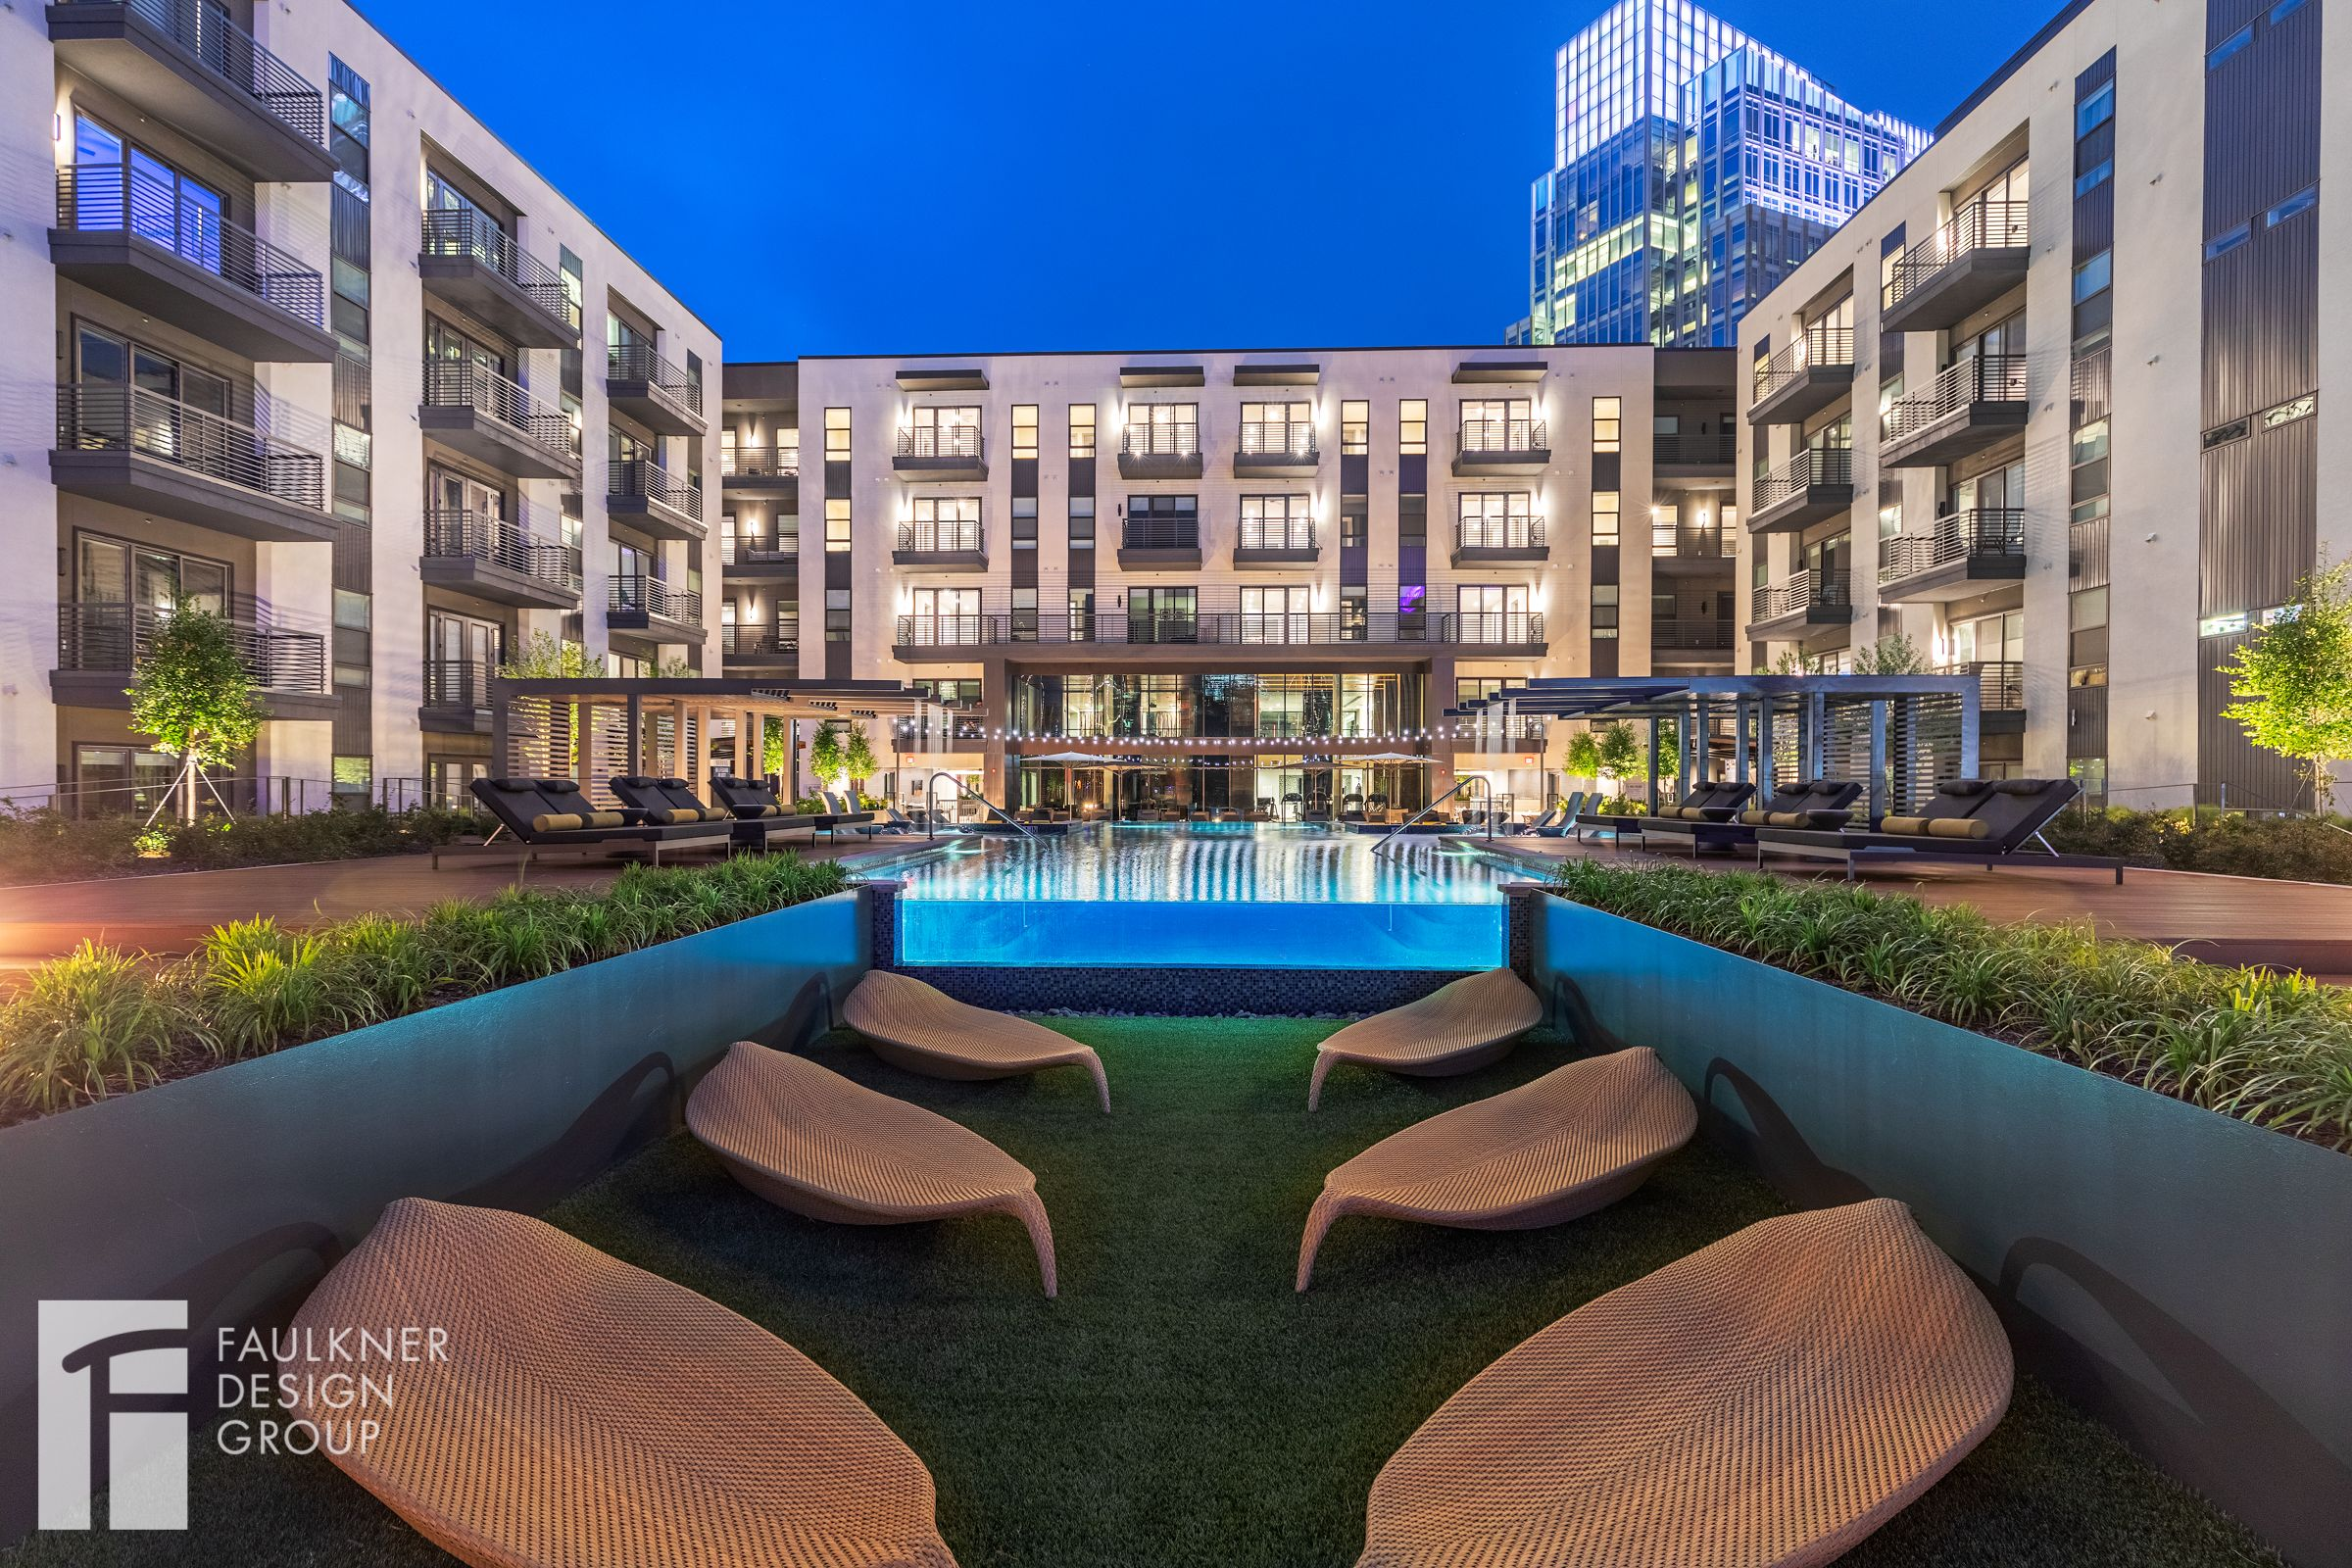 Designed By Faulkner Design Group Outdoorlounge Amenityspace Loungers Infinitypool Luxurypool Luxury Apartments Nyc Apartment Design Luxury Townhomes